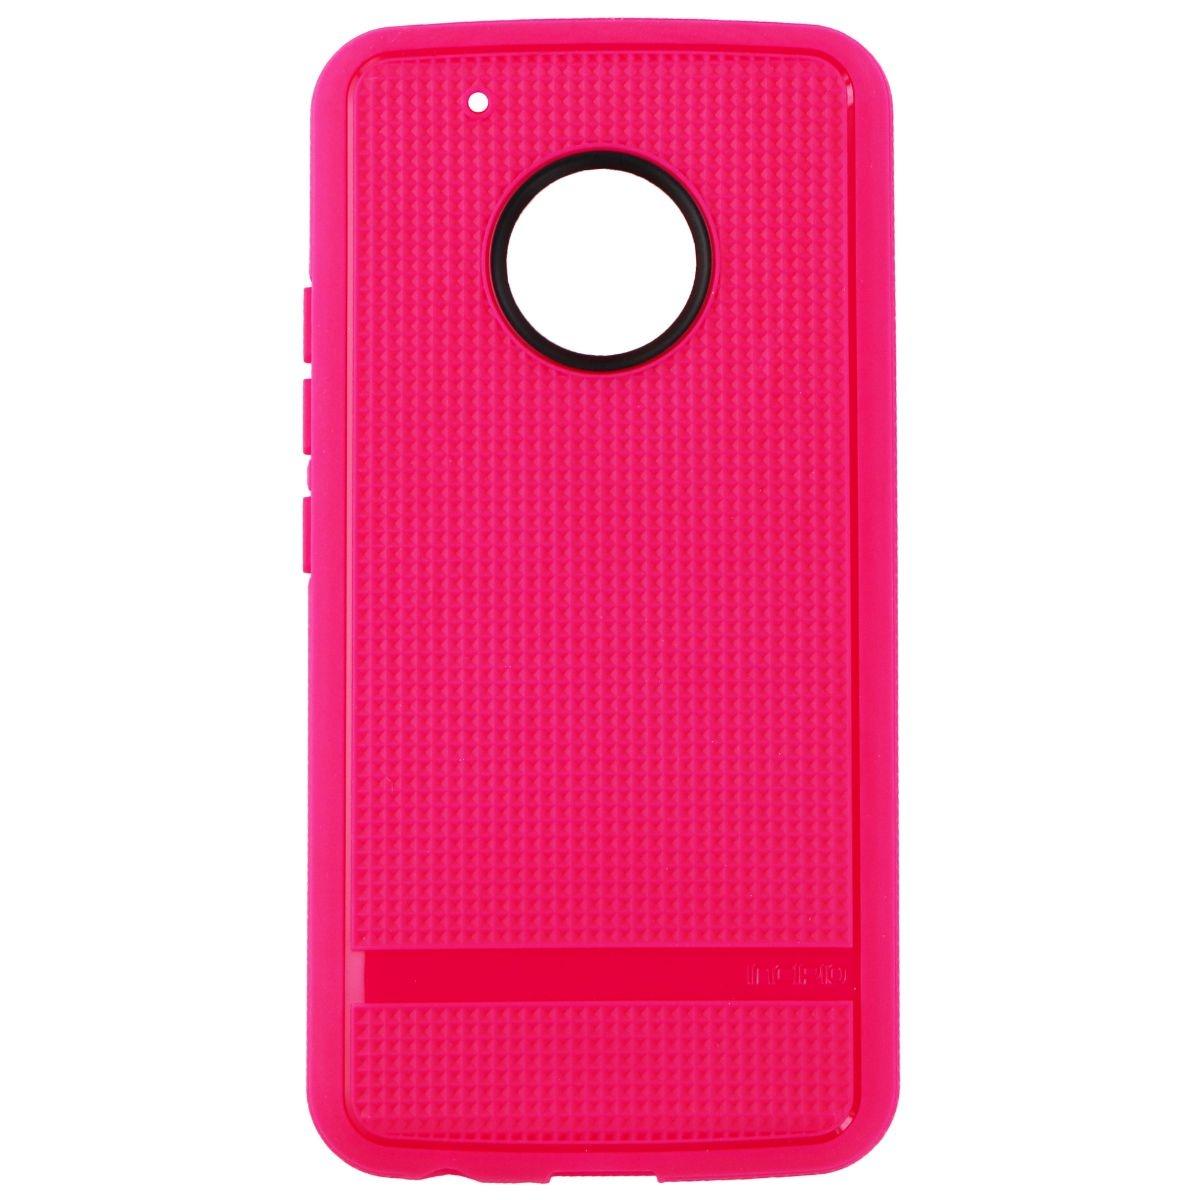 Incipio NGP Advanced Case for Motorola Moto G5 Plus Smartphone - Berry Pink